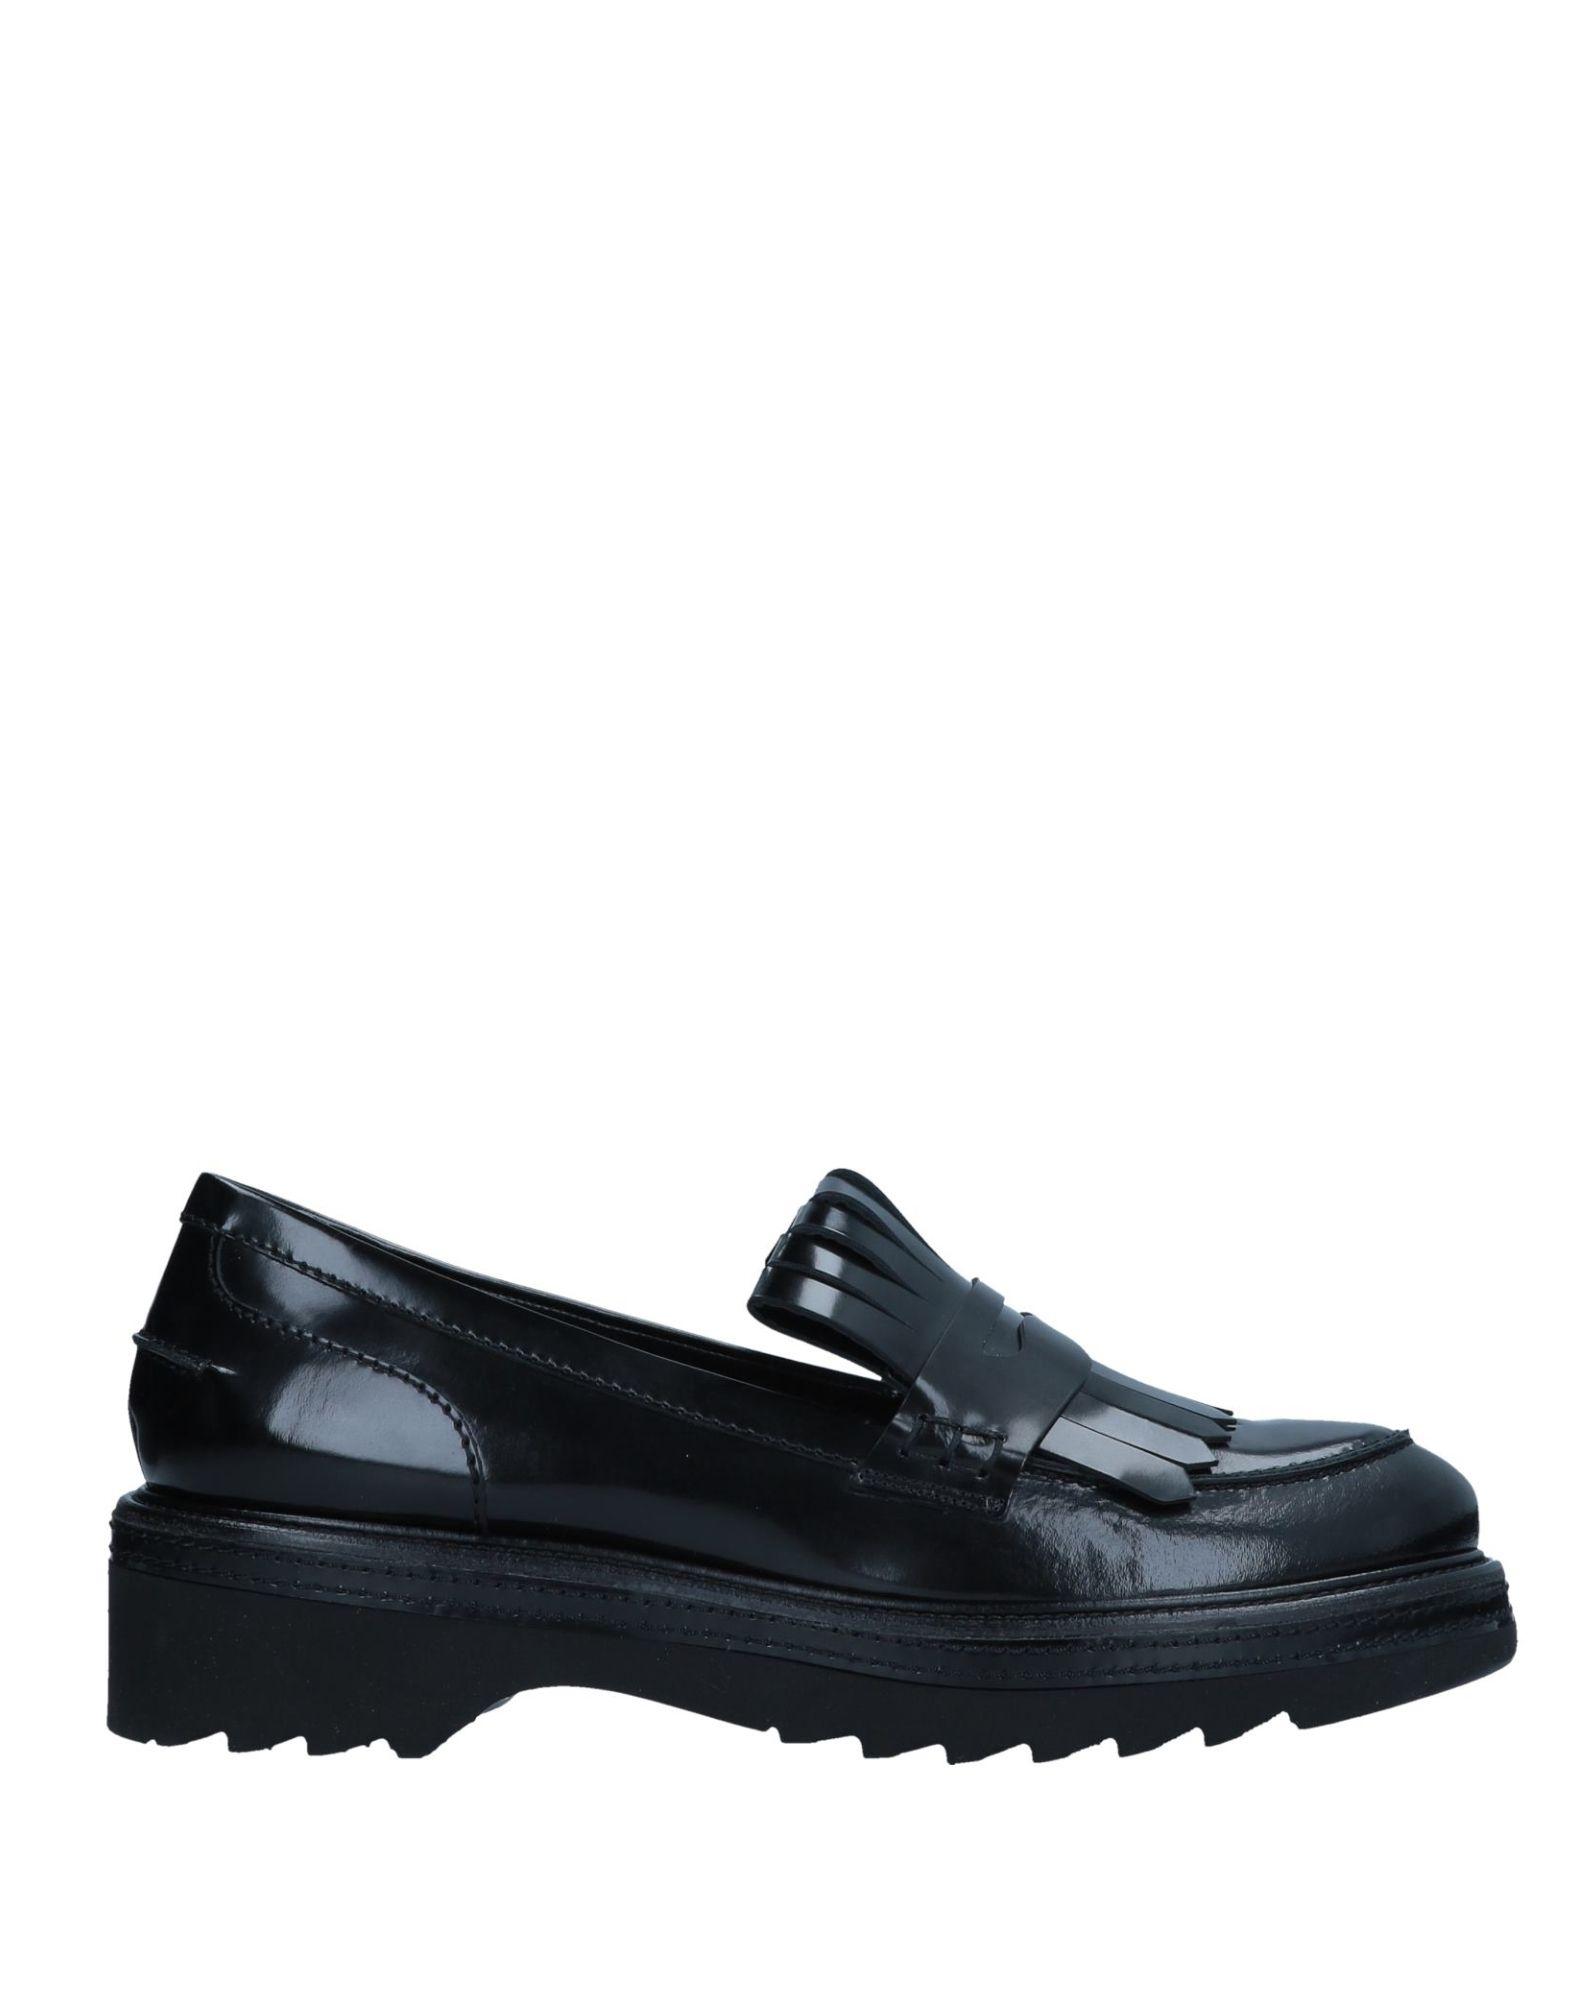 Stilvolle billige Schuhe Guglielmo Rotta Mokassins Damen  11313266WM